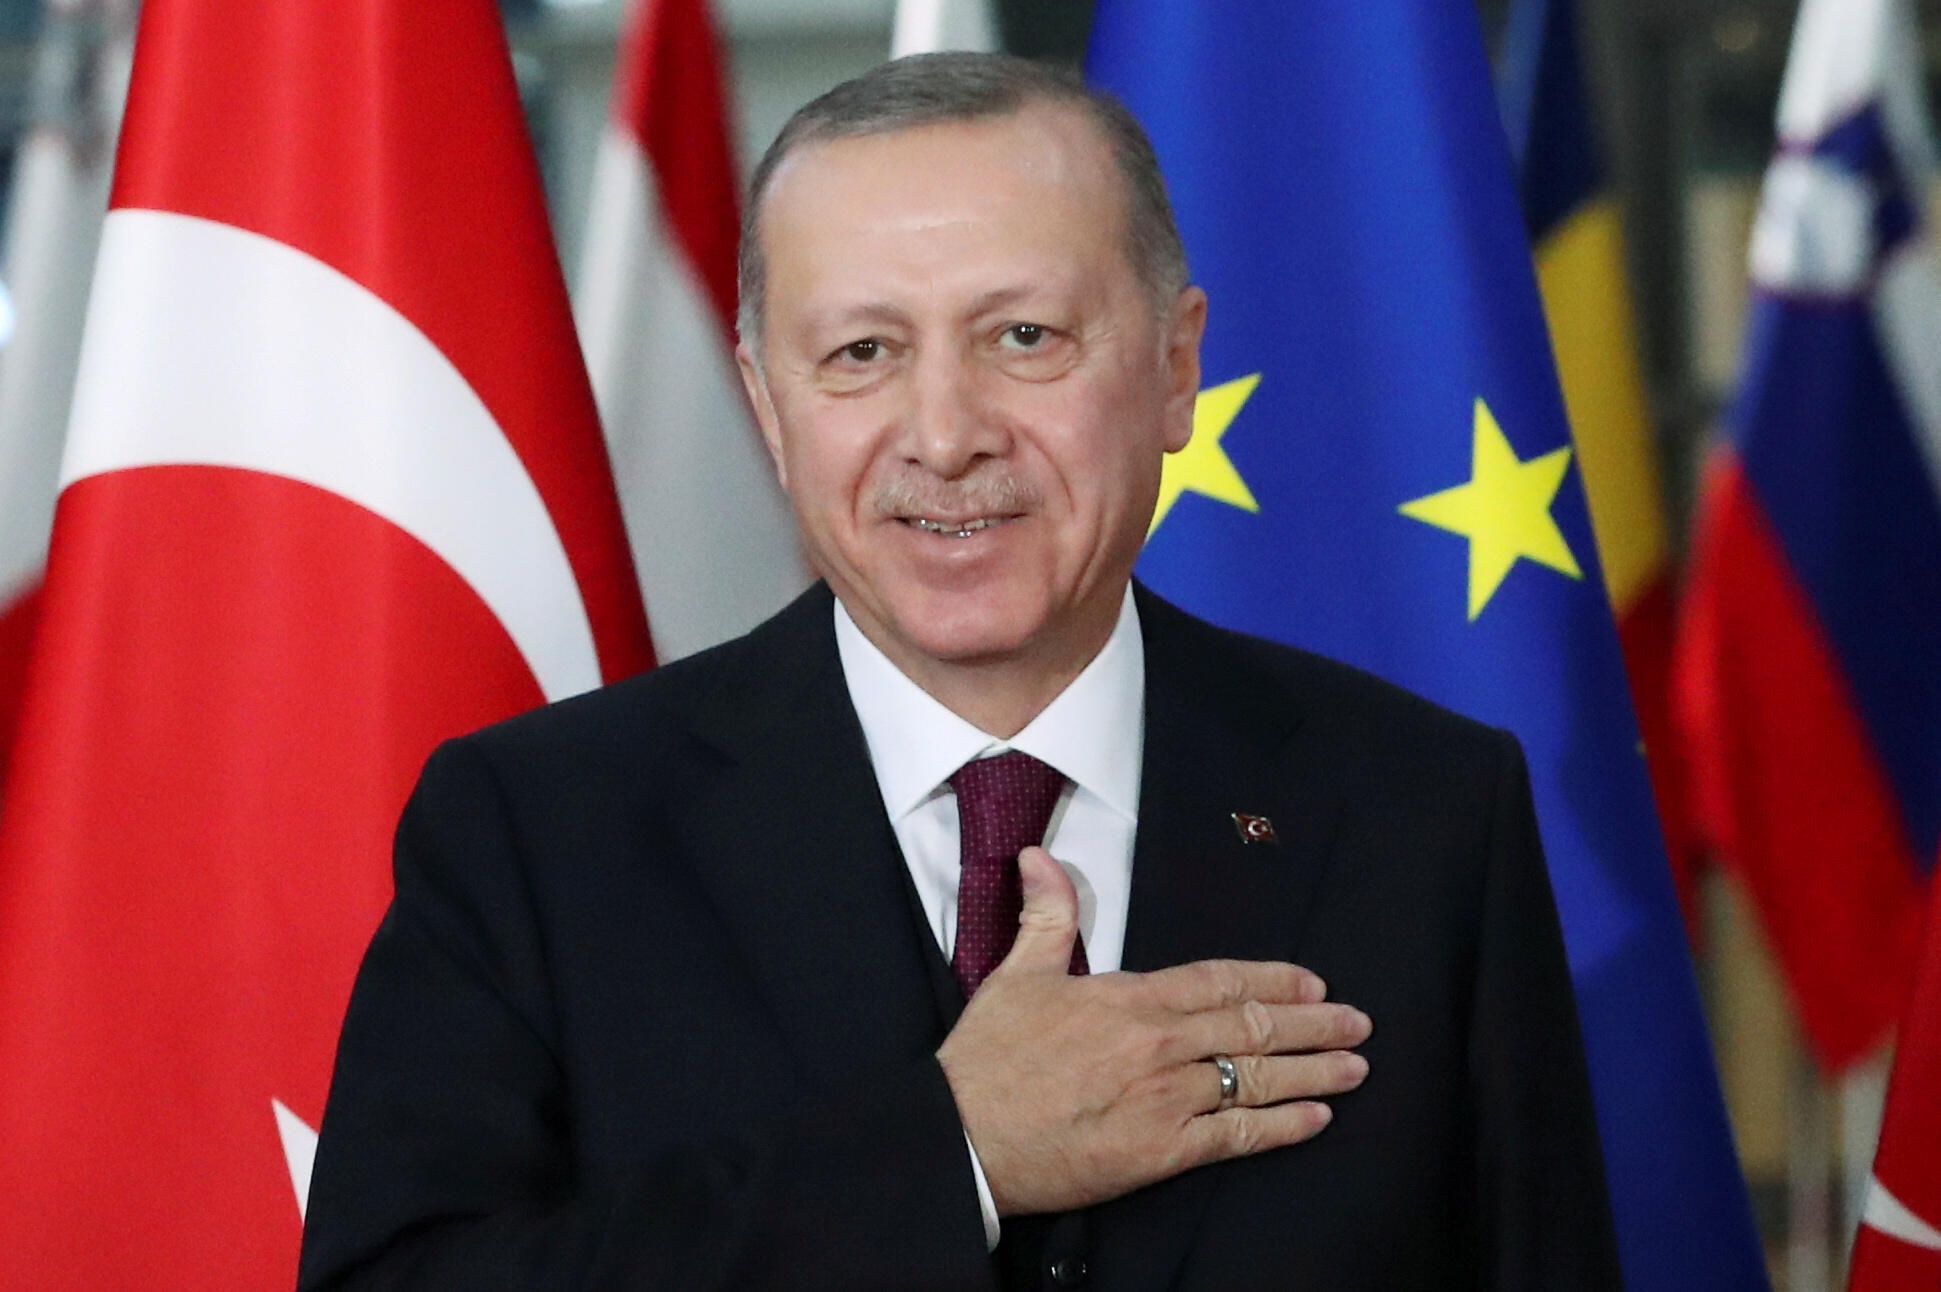 2020-06-12T000000Z_1753761329_RC2R7H9QHY7B_RTRMADP_3_CHINA-TWITTER-DISINFORMATION-TURKEY